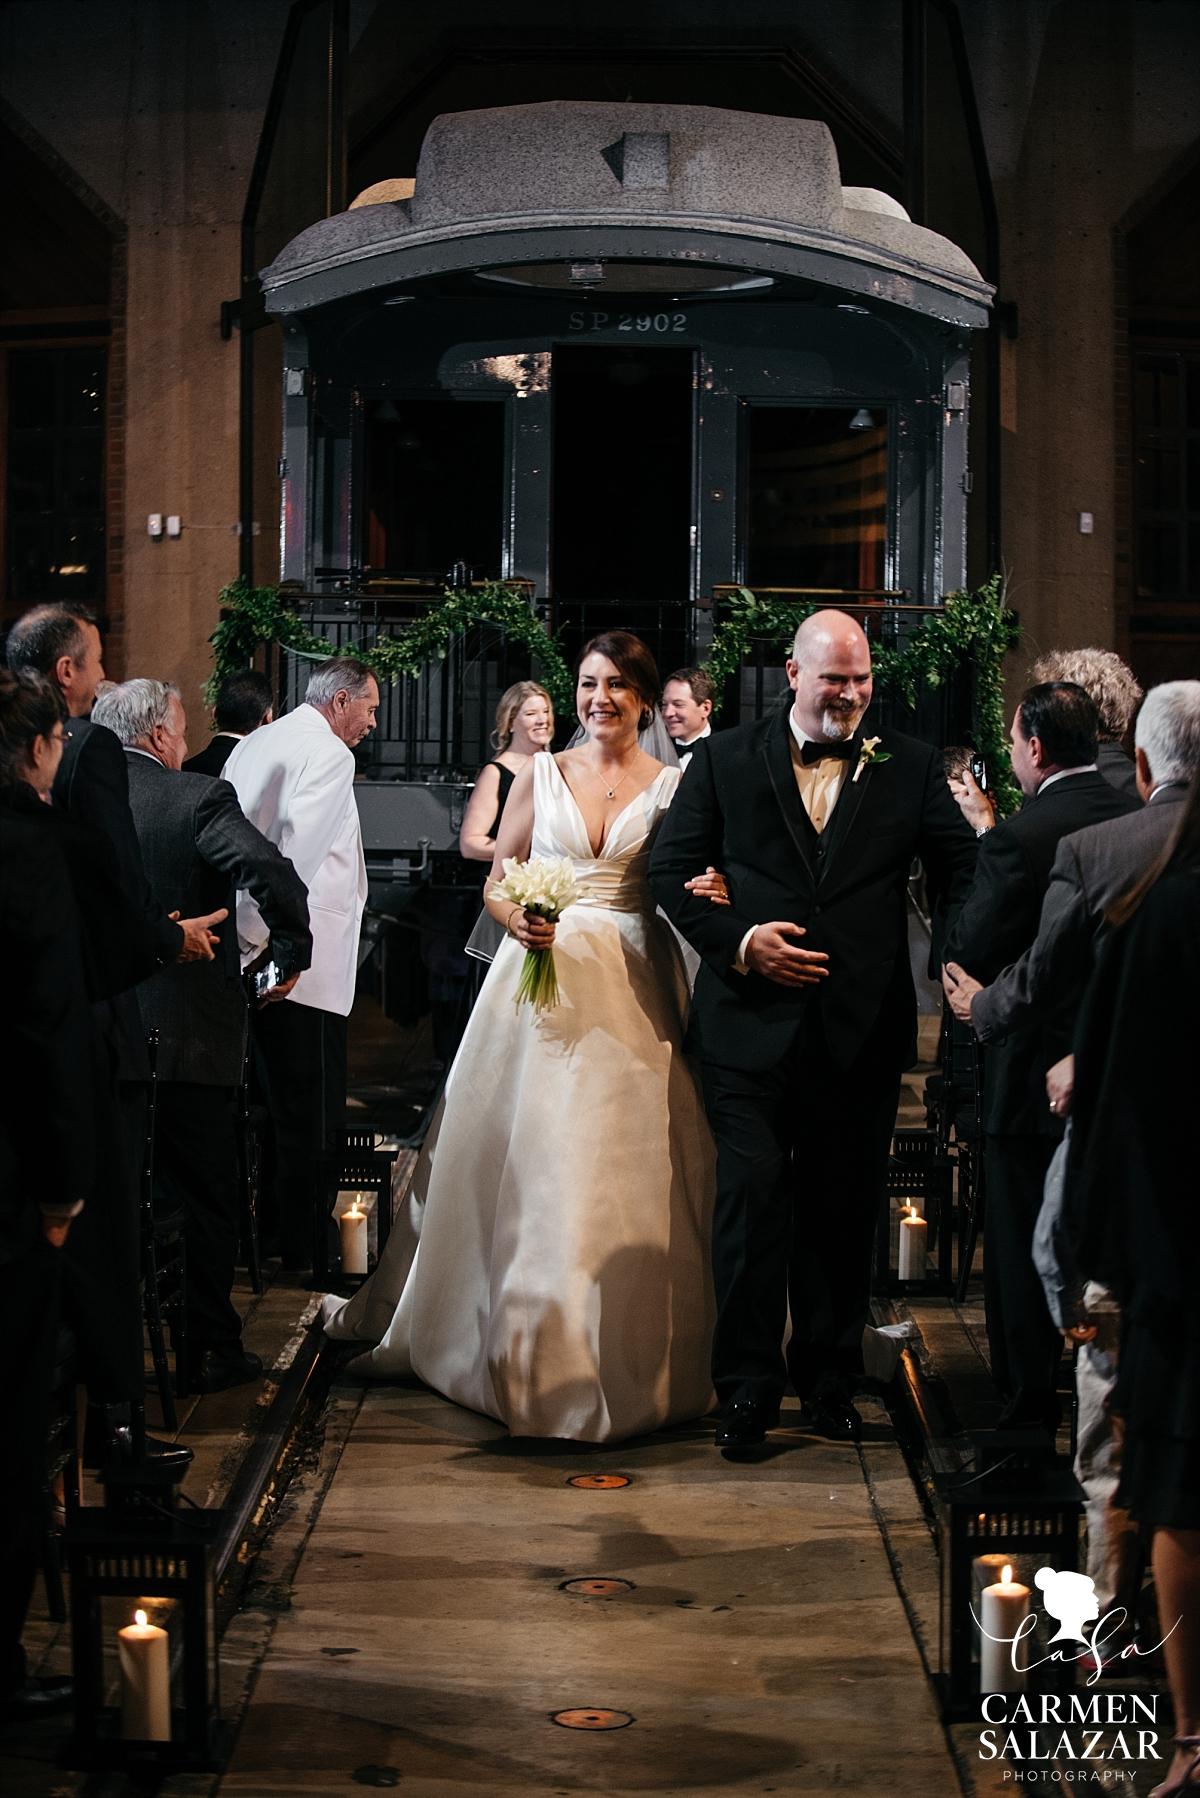 Newlyweds at California Railroad Museum - Carmen Salazar